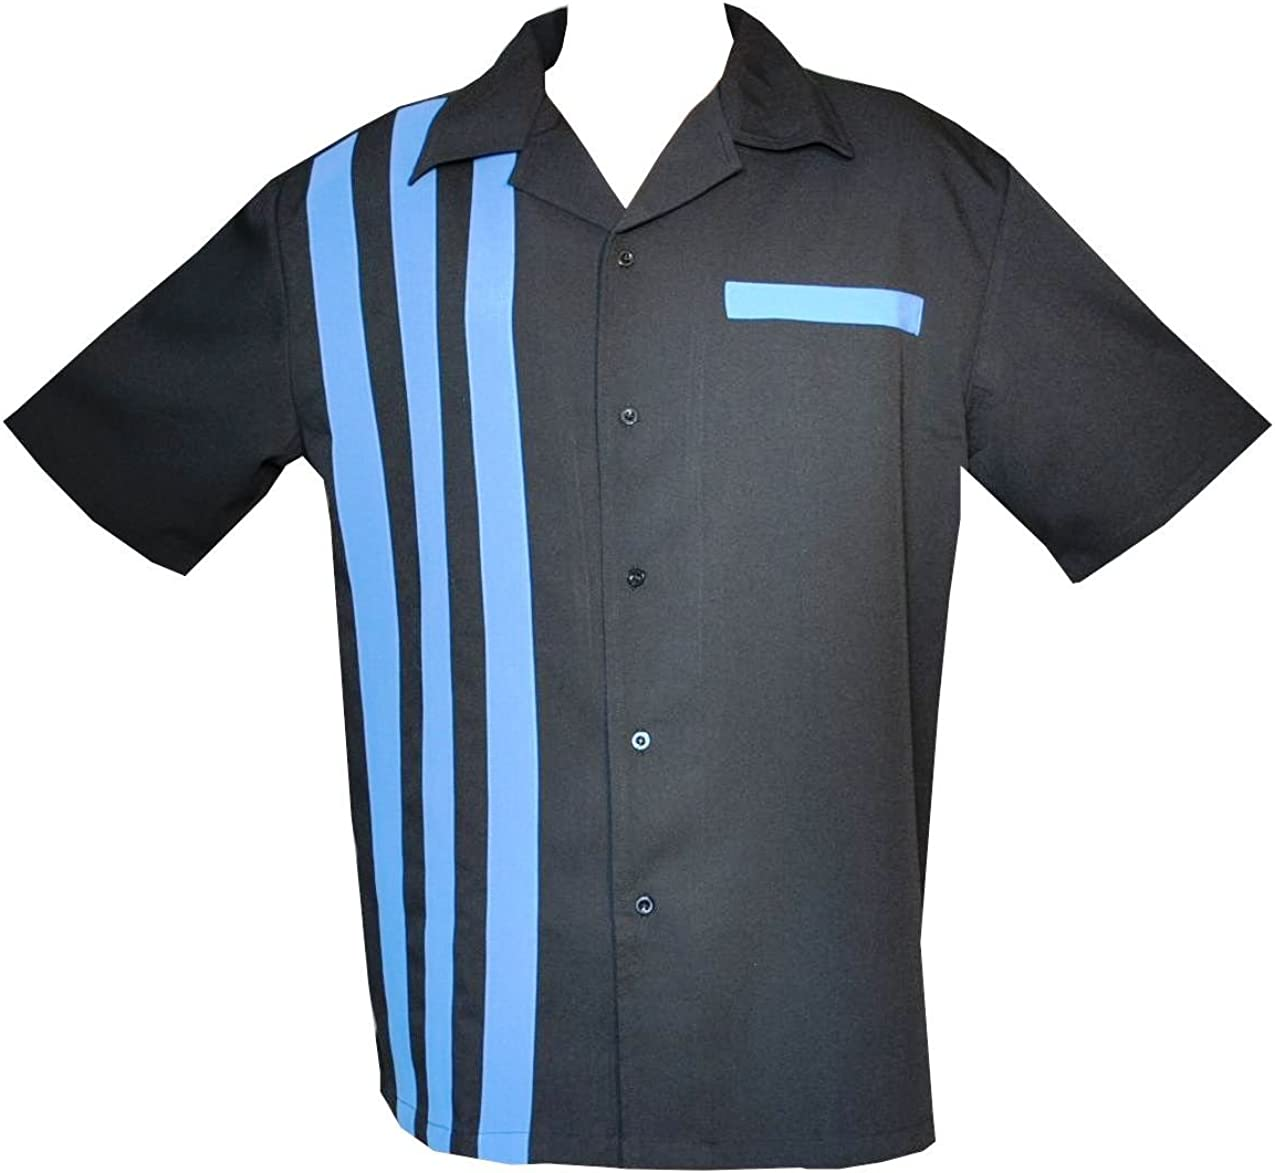 San Diego Mall Attila Bowling Shirt Max 47% OFF Big and Tall BluRef Charlie 50s Sheen Retro